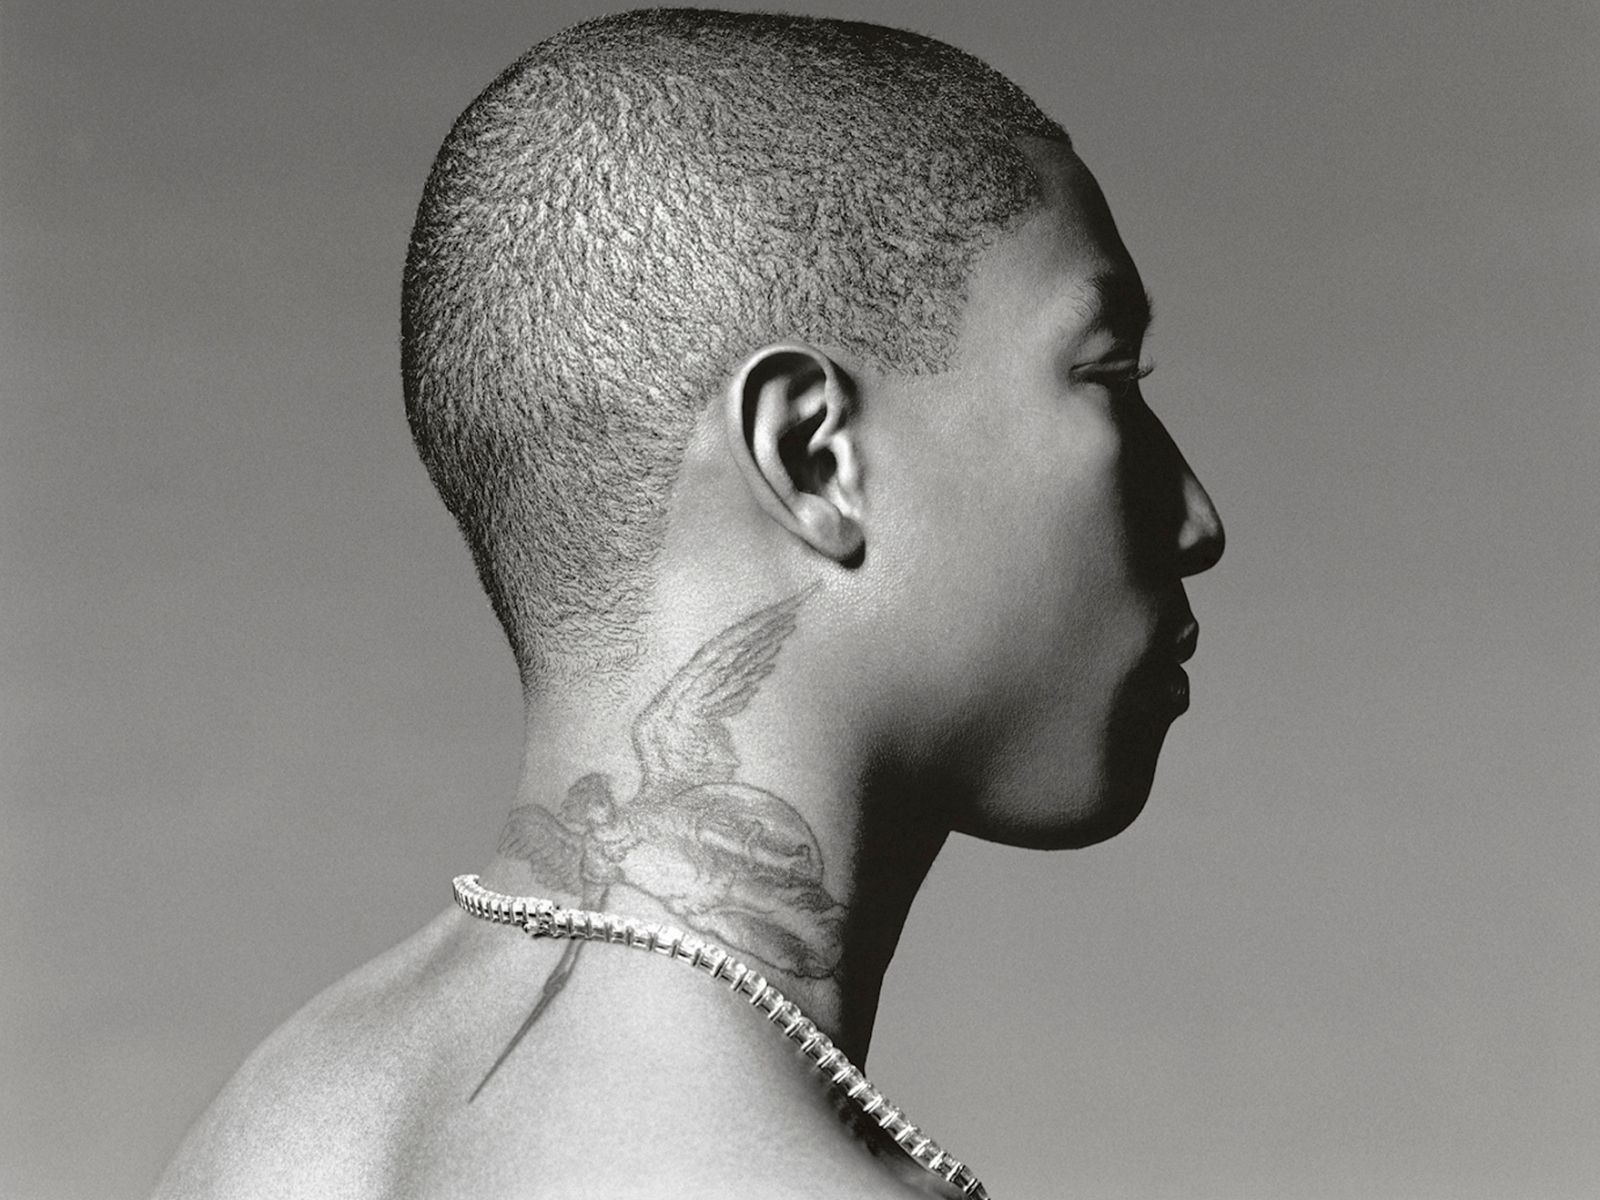 Pharrell's neck tattoo looks good Tattoos Pinterest